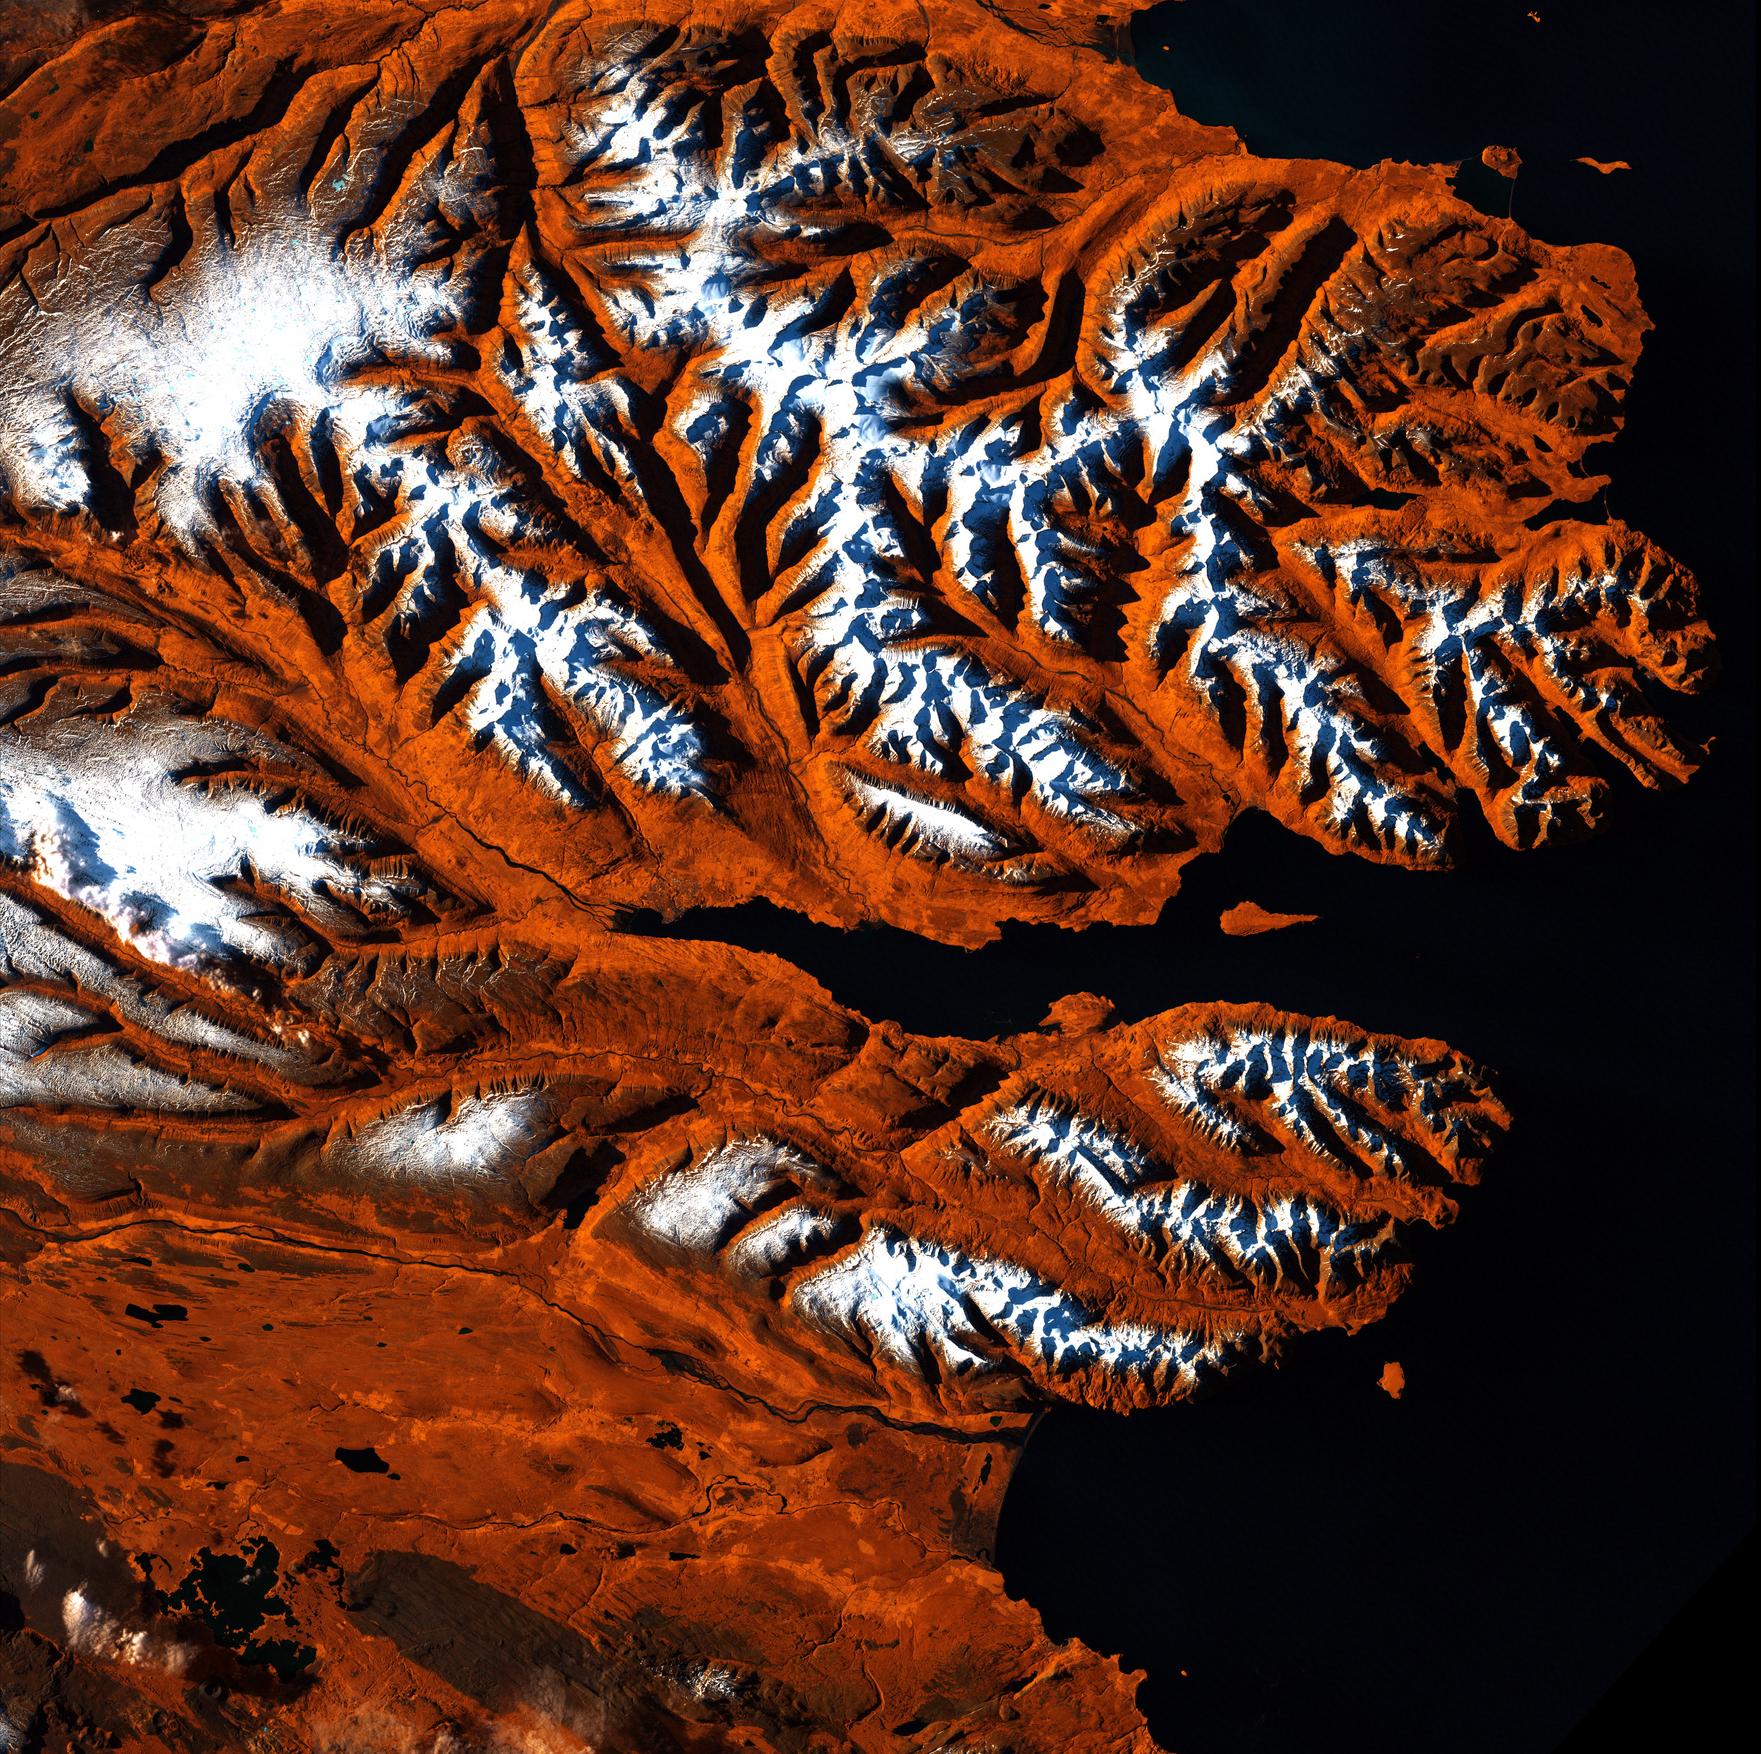 Icelandic Tigers and Von Karman Vortices: Landsat Imagery